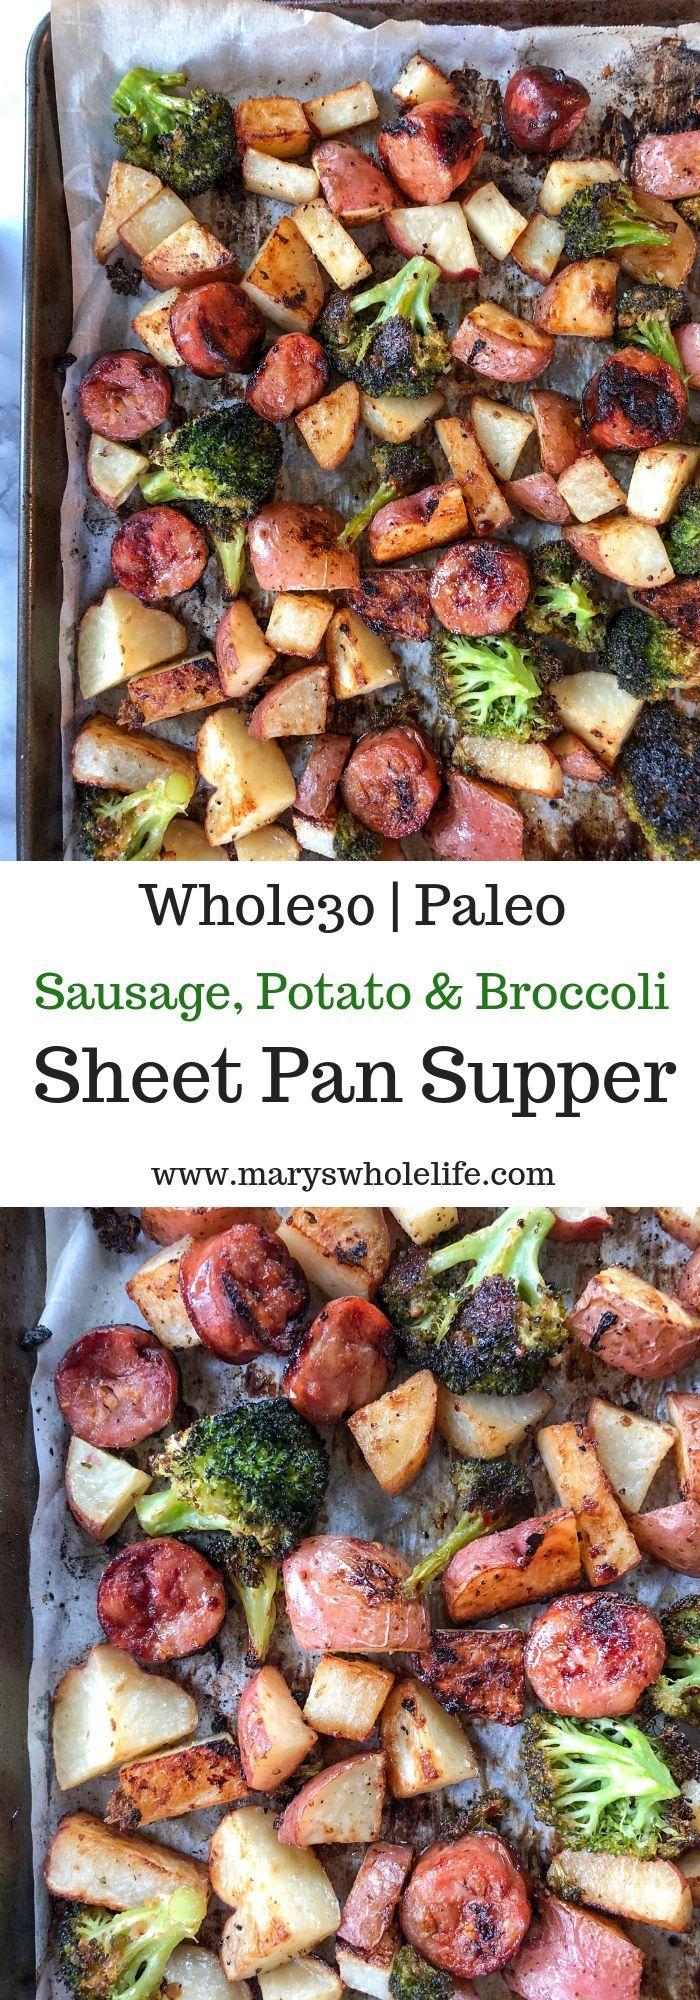 Sausage, Potato & Broccoli Sheet Pan Supper #quickandeasydinnerrecipes